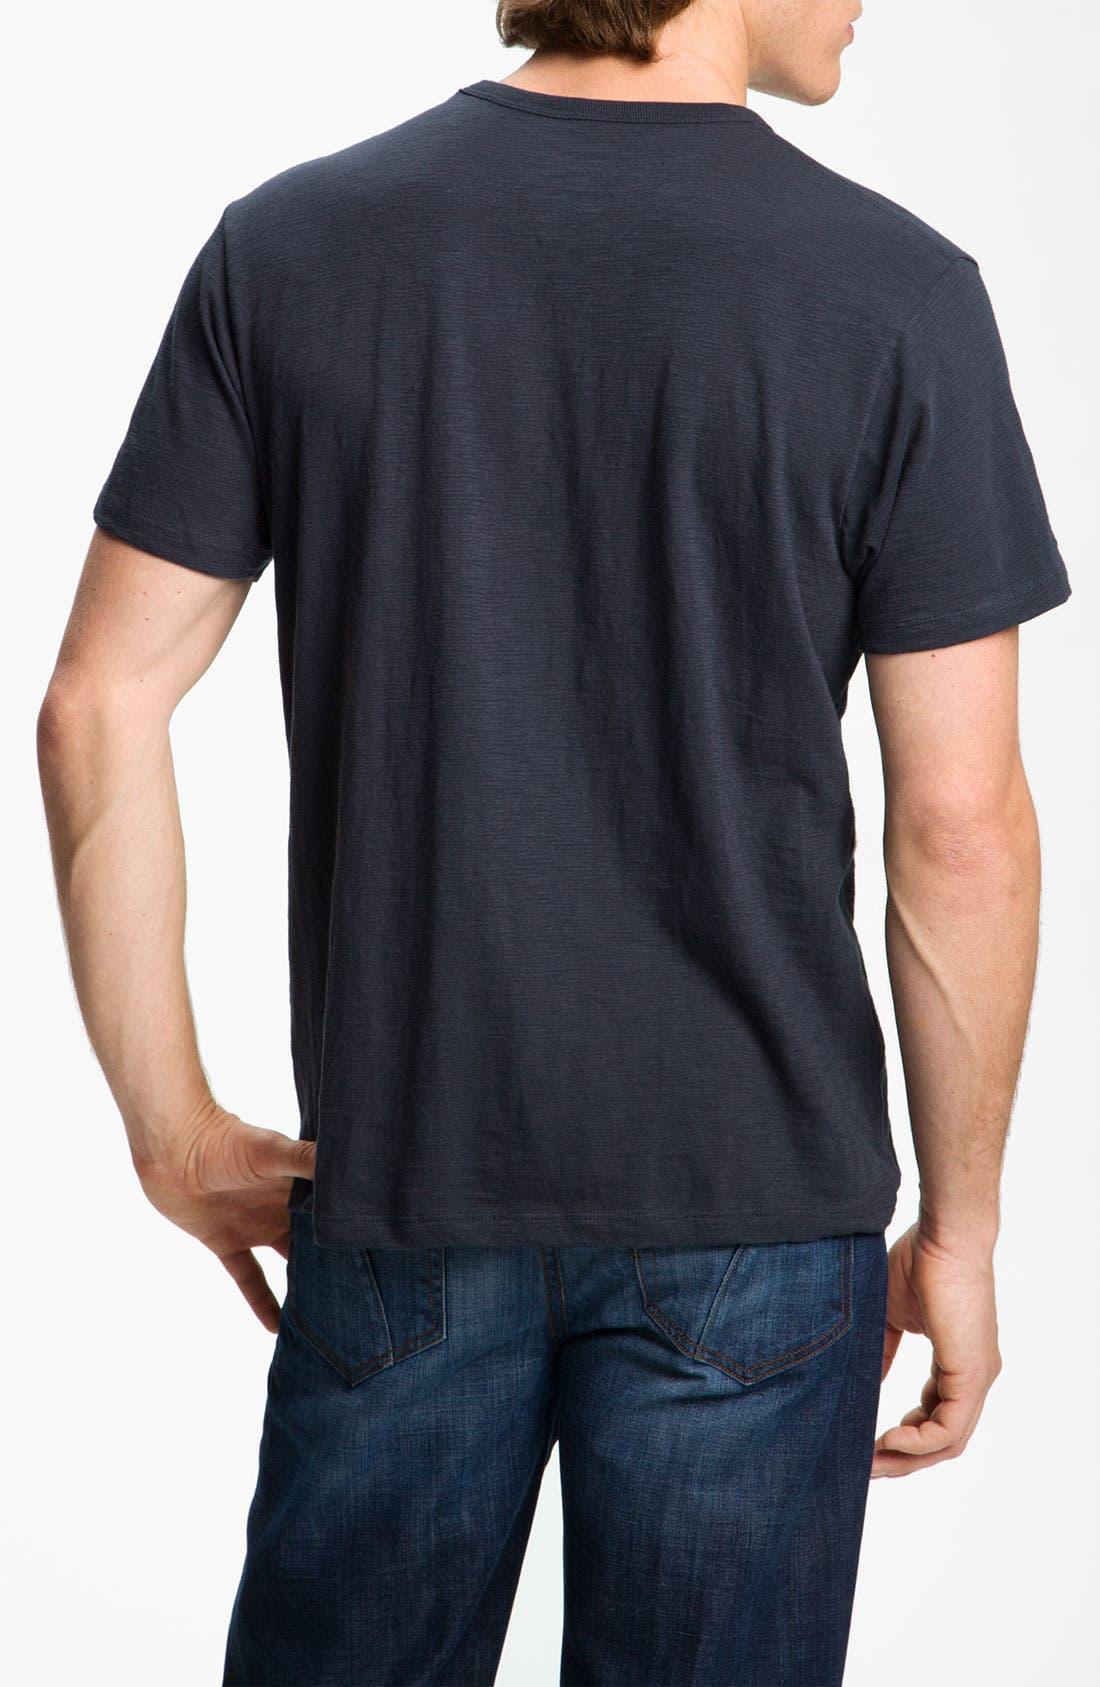 'Chicago Cubs' Regular Fit Crewneck T-Shirt,                             Alternate thumbnail 36, color,